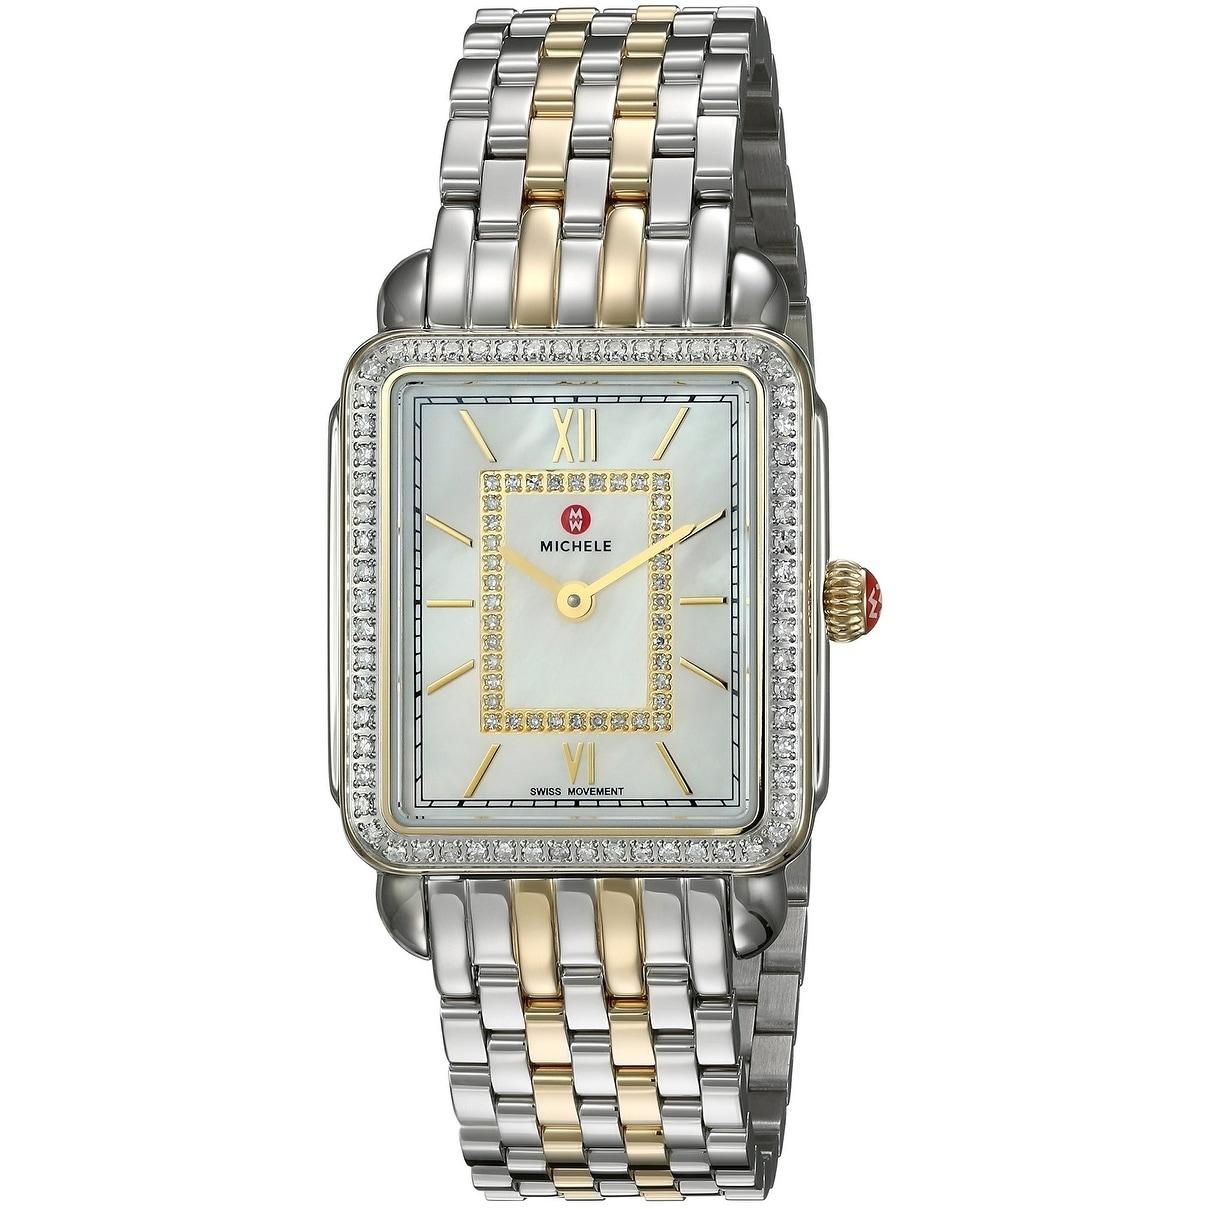 da30f83e39b Shop Michele Deco II Diamond Two-Tone Ladies Watch MWW06I000004 - Free  Shipping Today - Overstock - 28110480